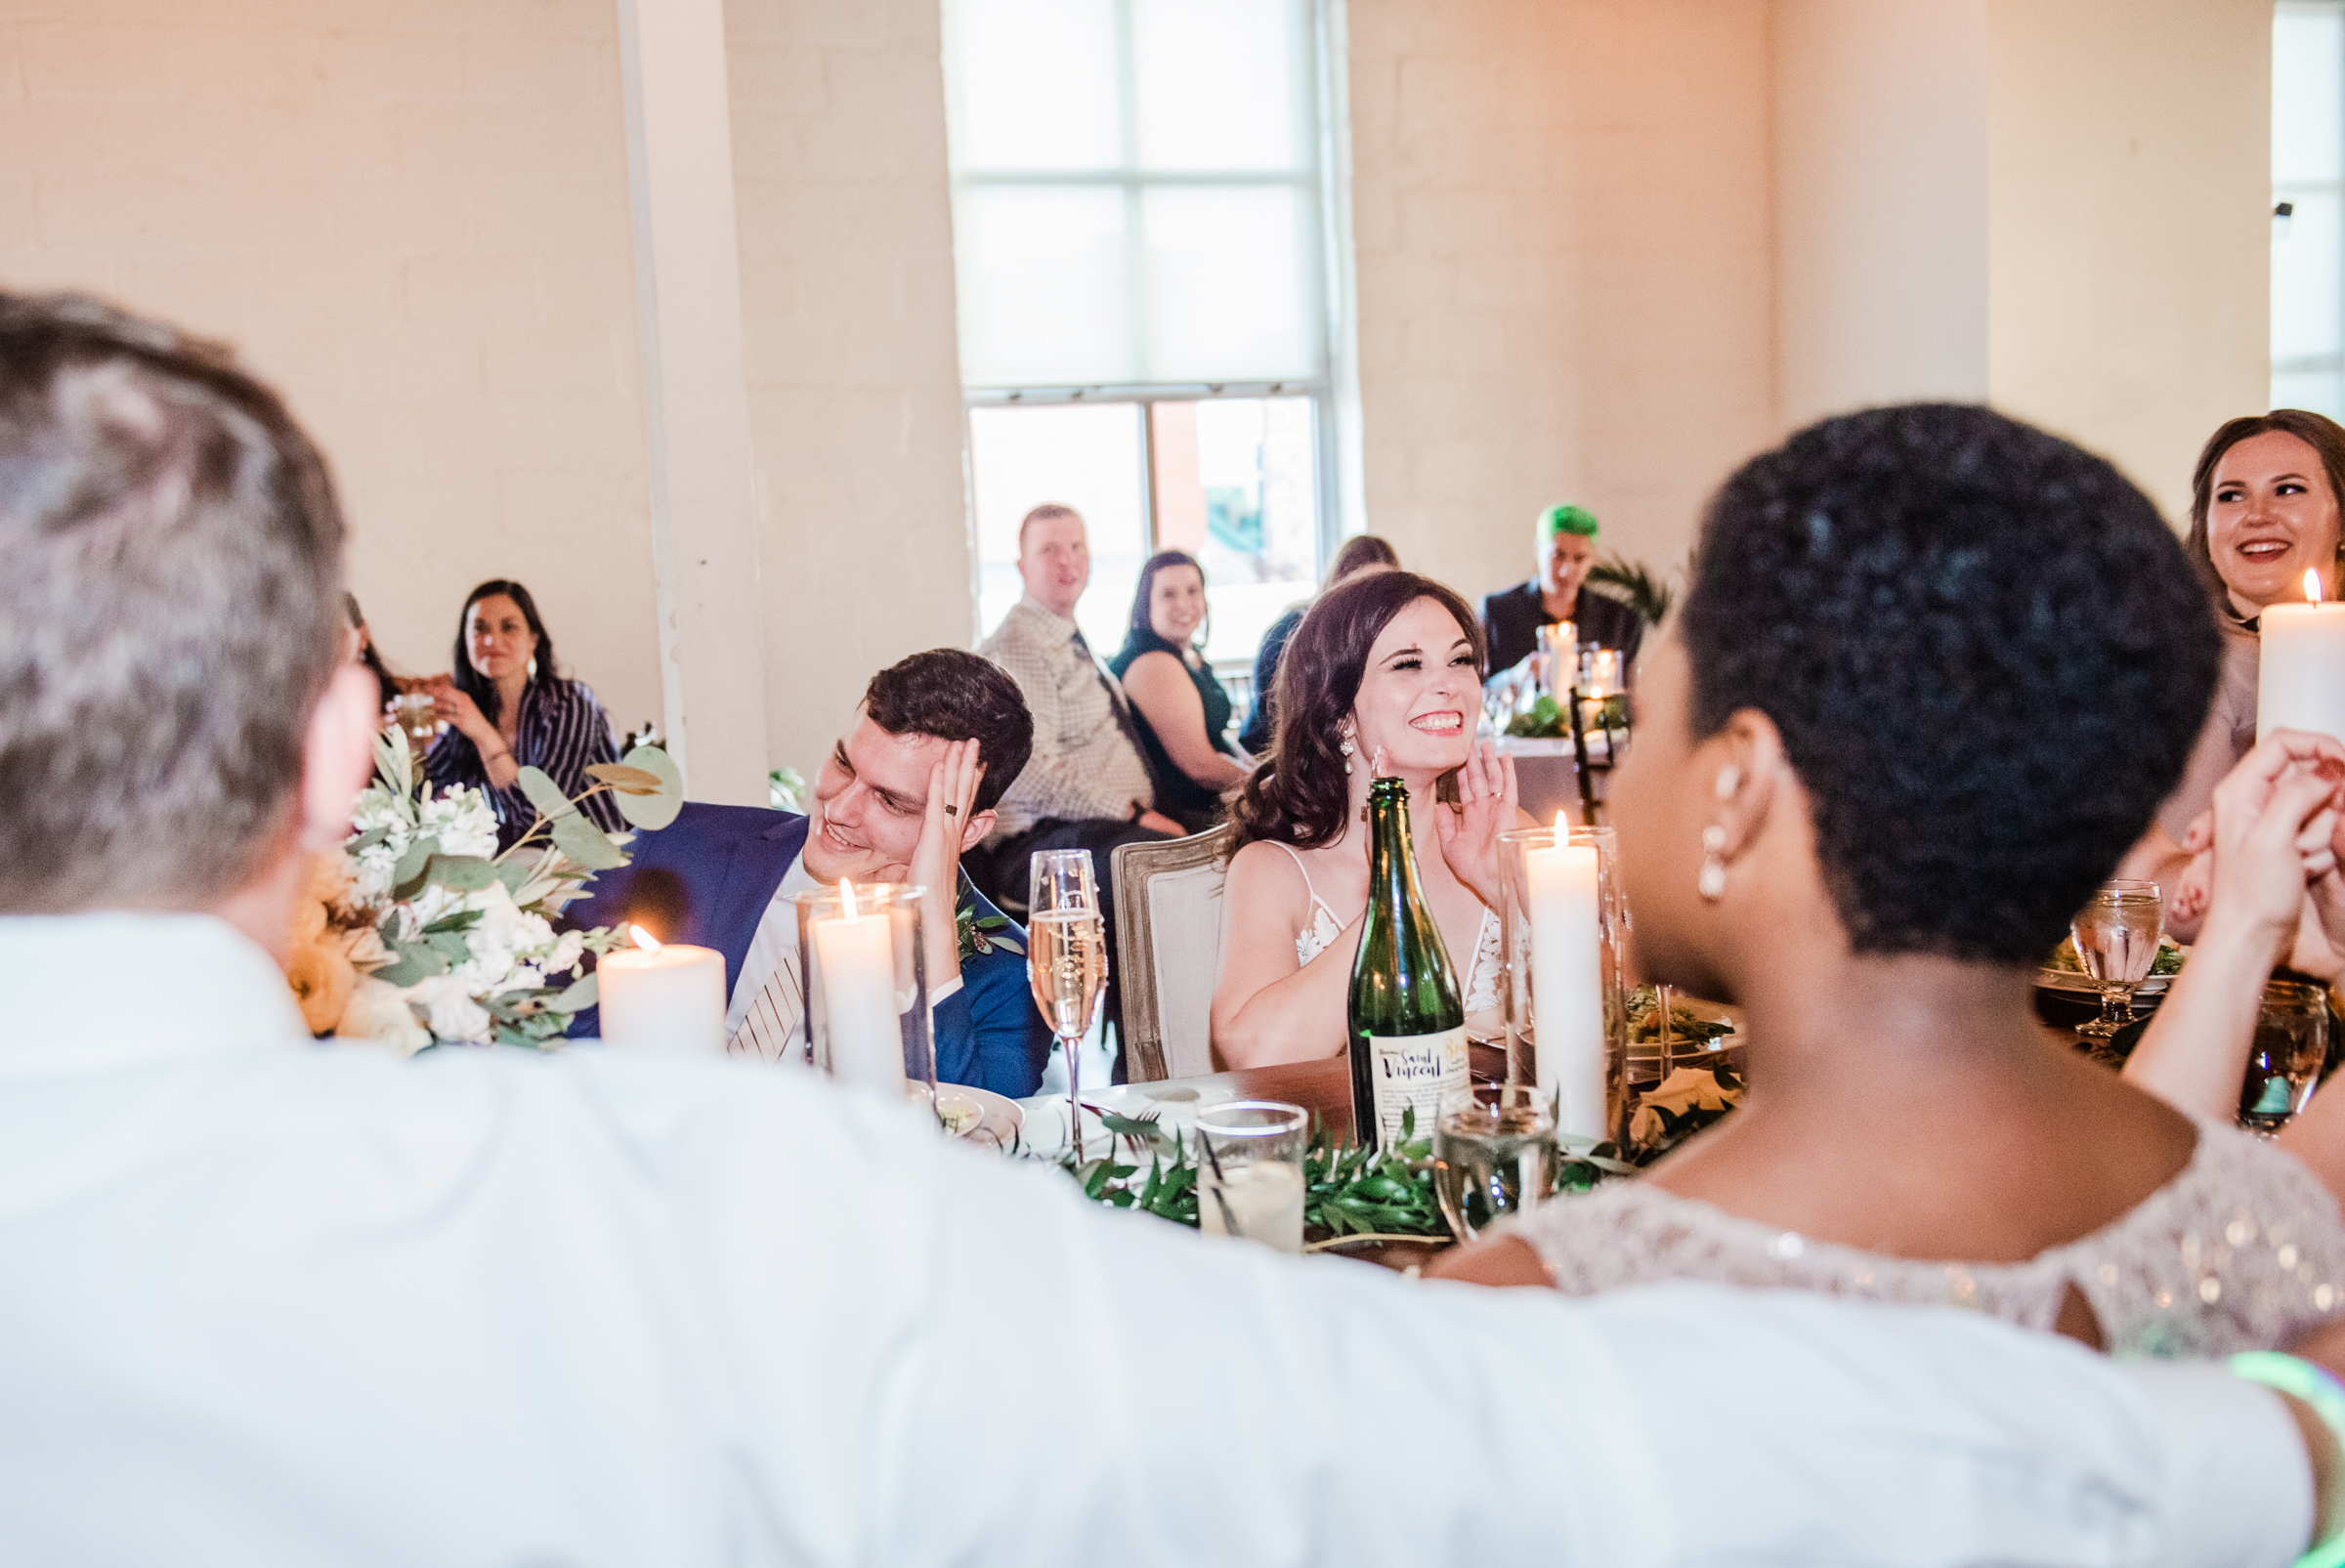 The_Arbor_LoftRochester_Wedding_JILL_STUDIO_Rochester_NY_Photographer_190020.jpg